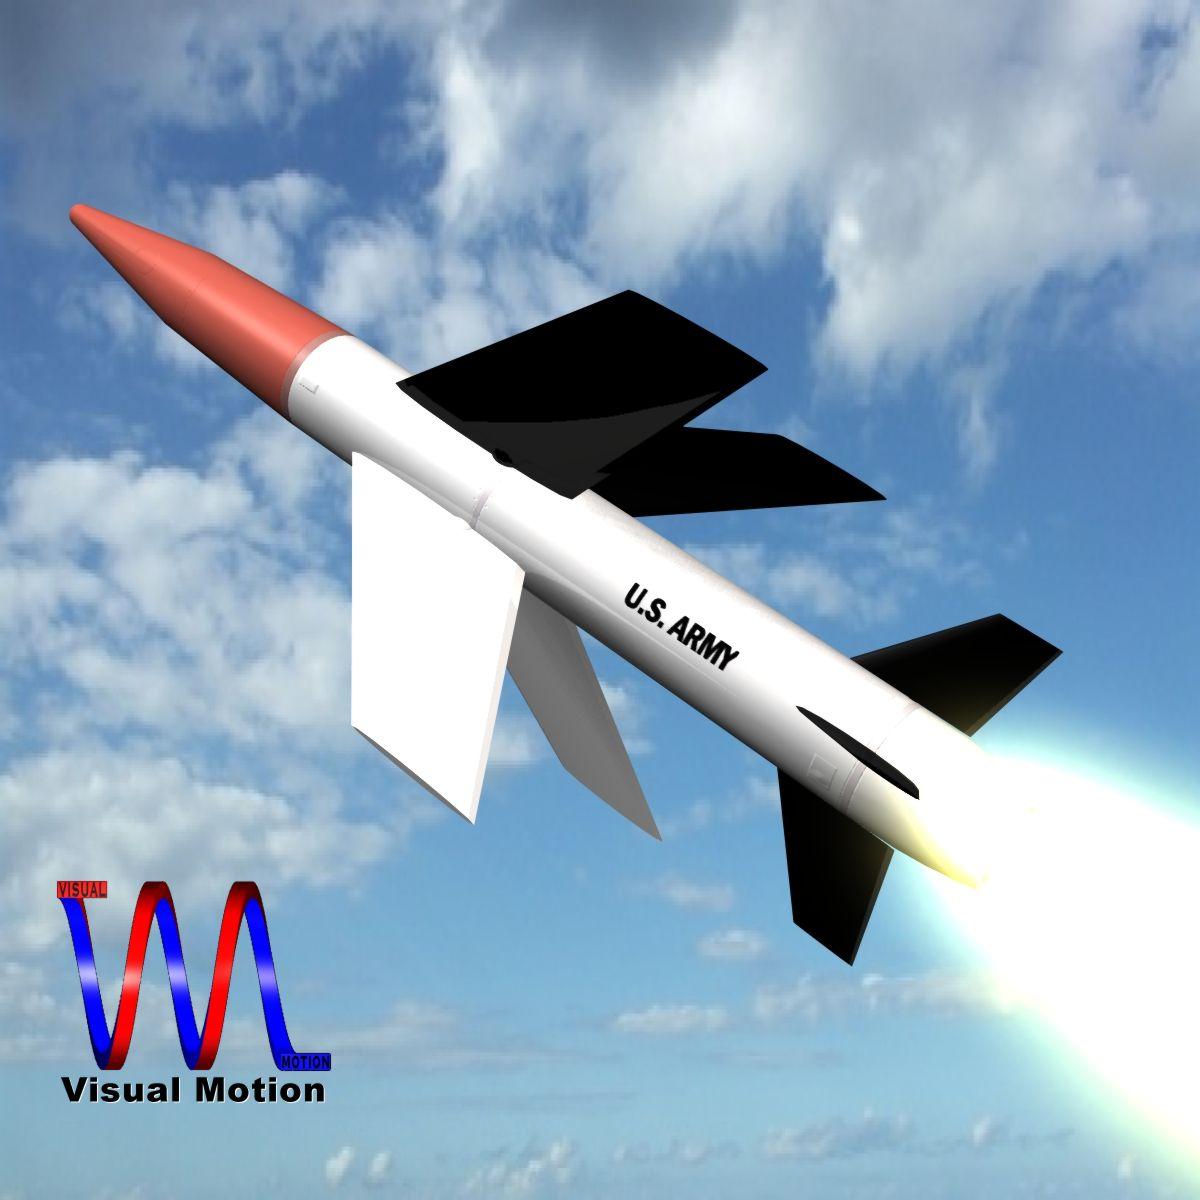 us mgm-18a raketa za lakros 3d model 3ds dxf cob x drugi obj 136516